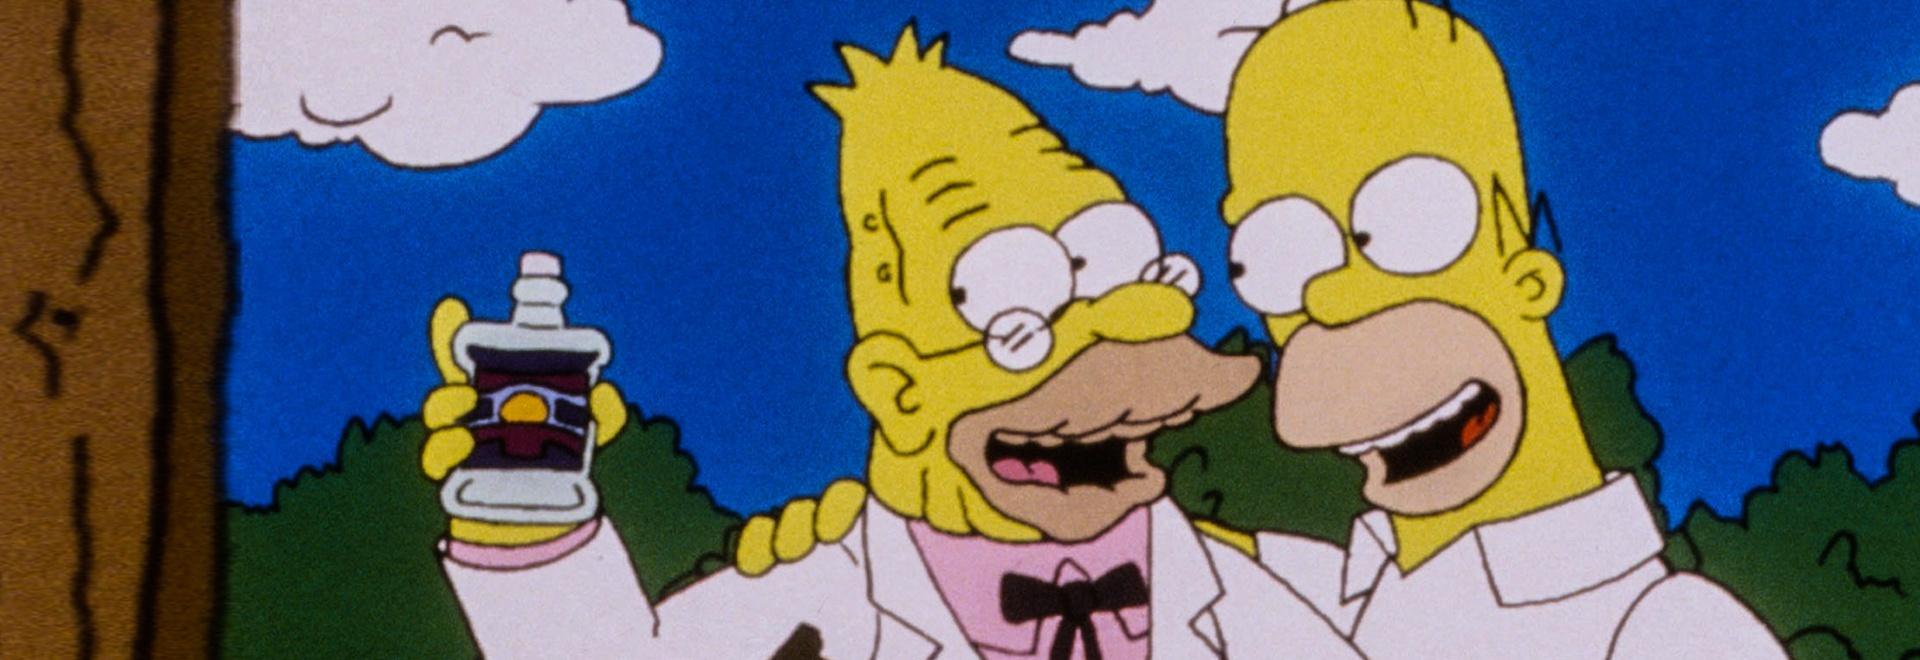 Homer il clown